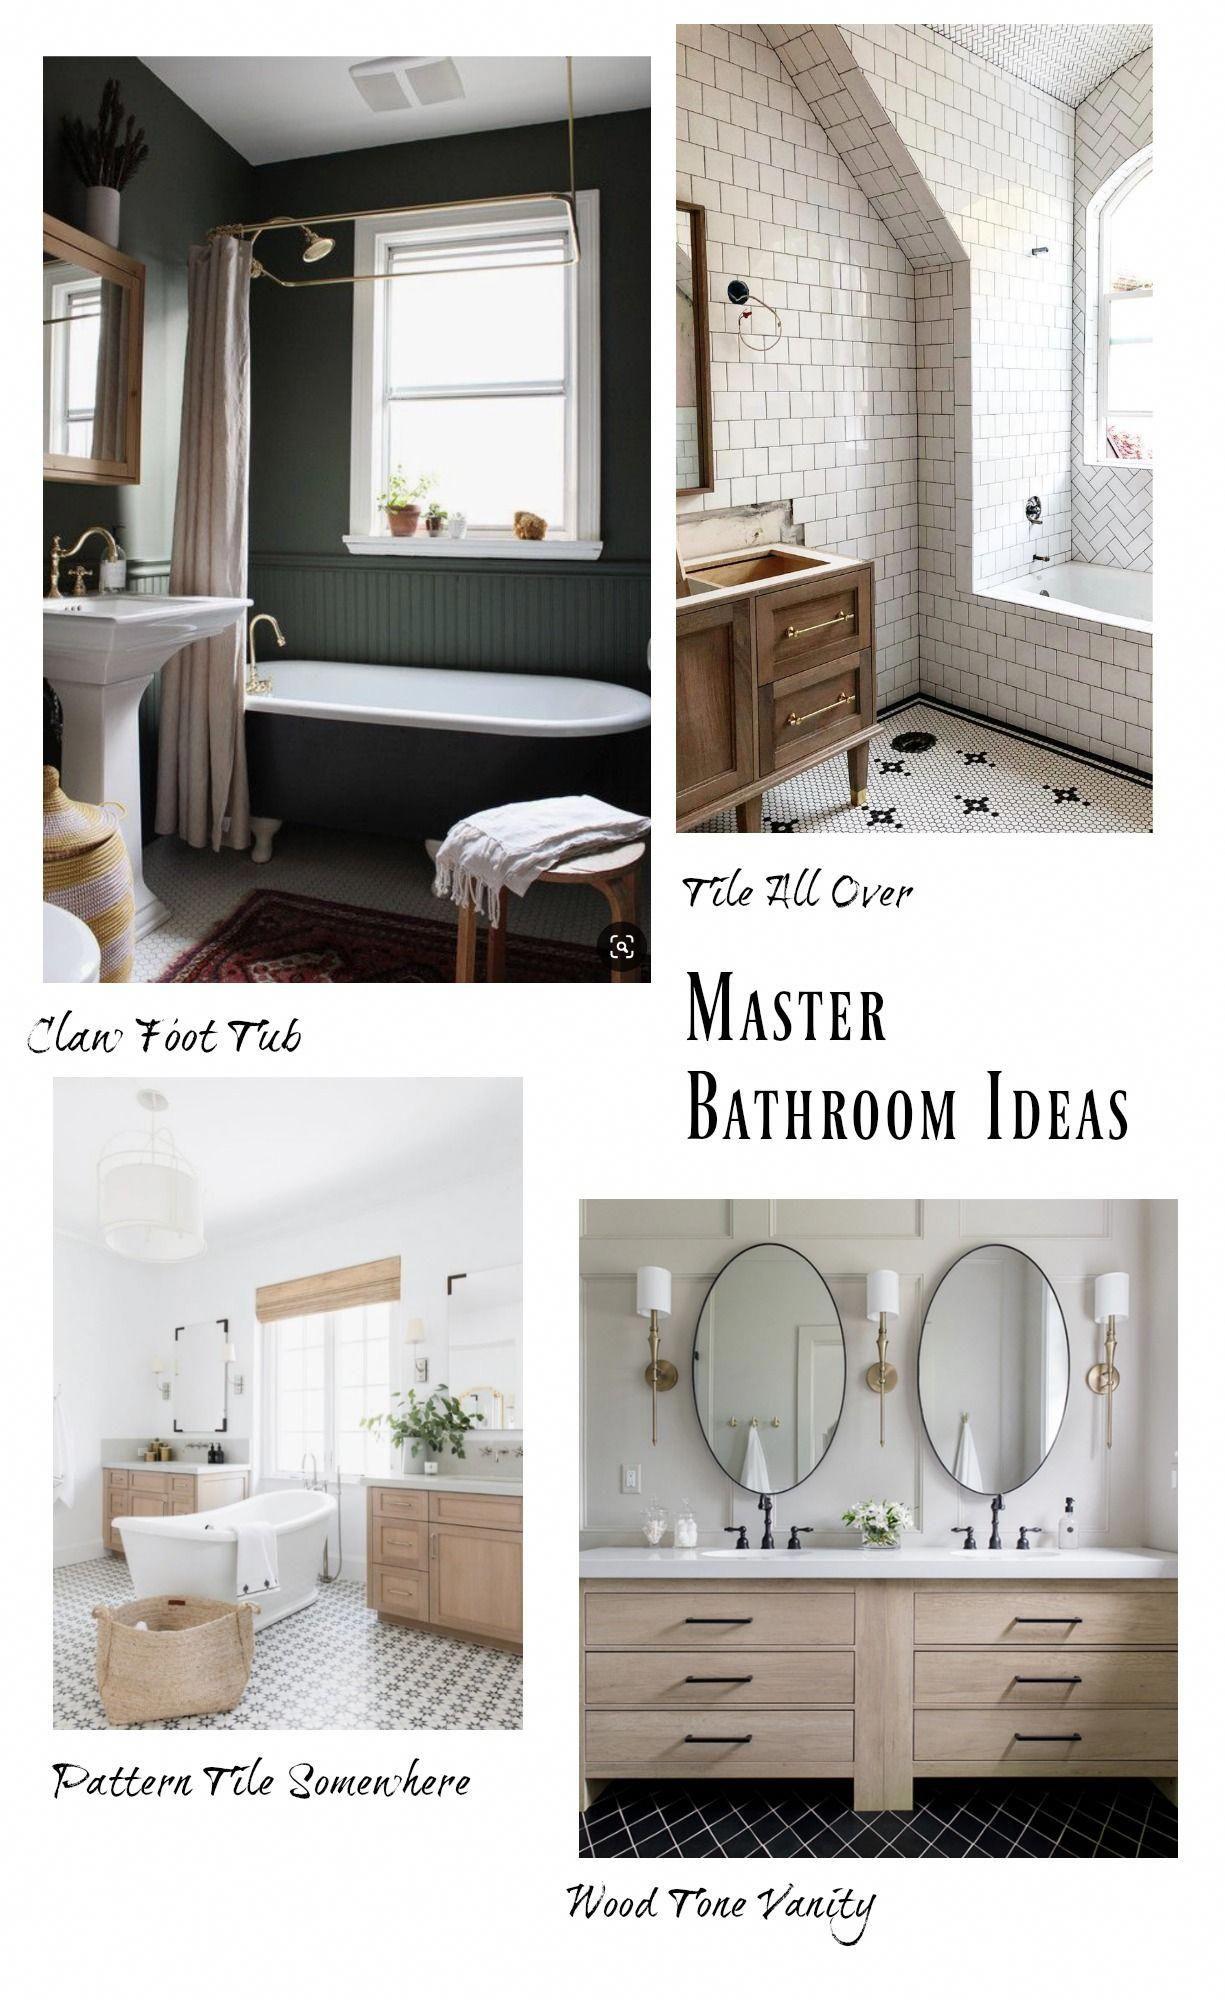 Affordable Master Bathroom Vanity Ideas In 2020 Simple Bathroom Decor Bathroom Farmhouse Style Bathroom Design Inspiration